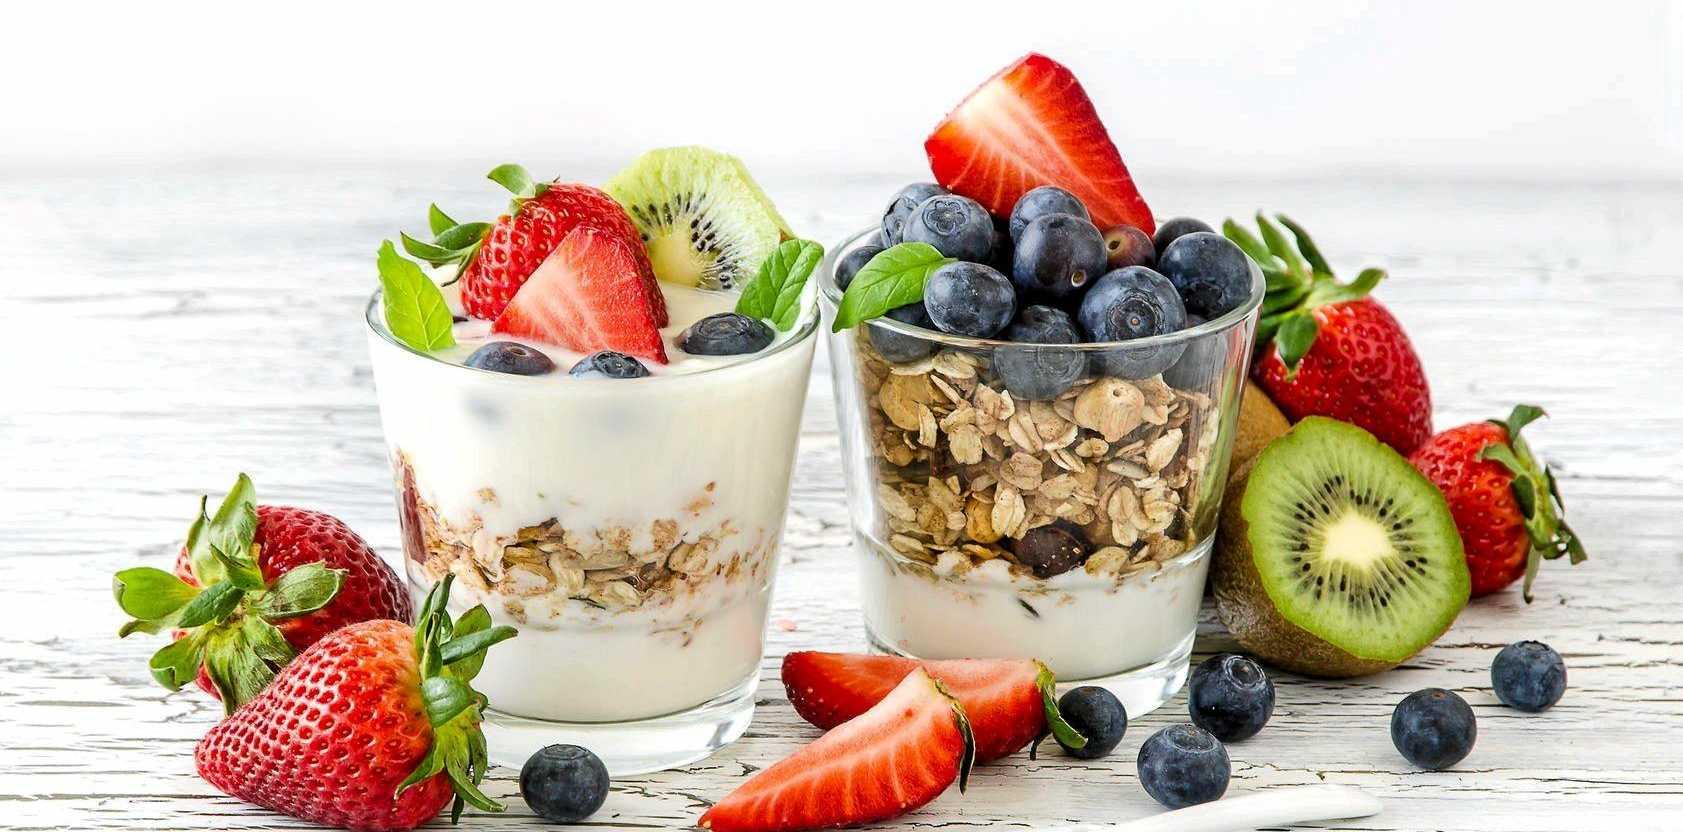 Dress up a healthy breakfast of fruit, muesli and yogurt for mum tomorrow morning.